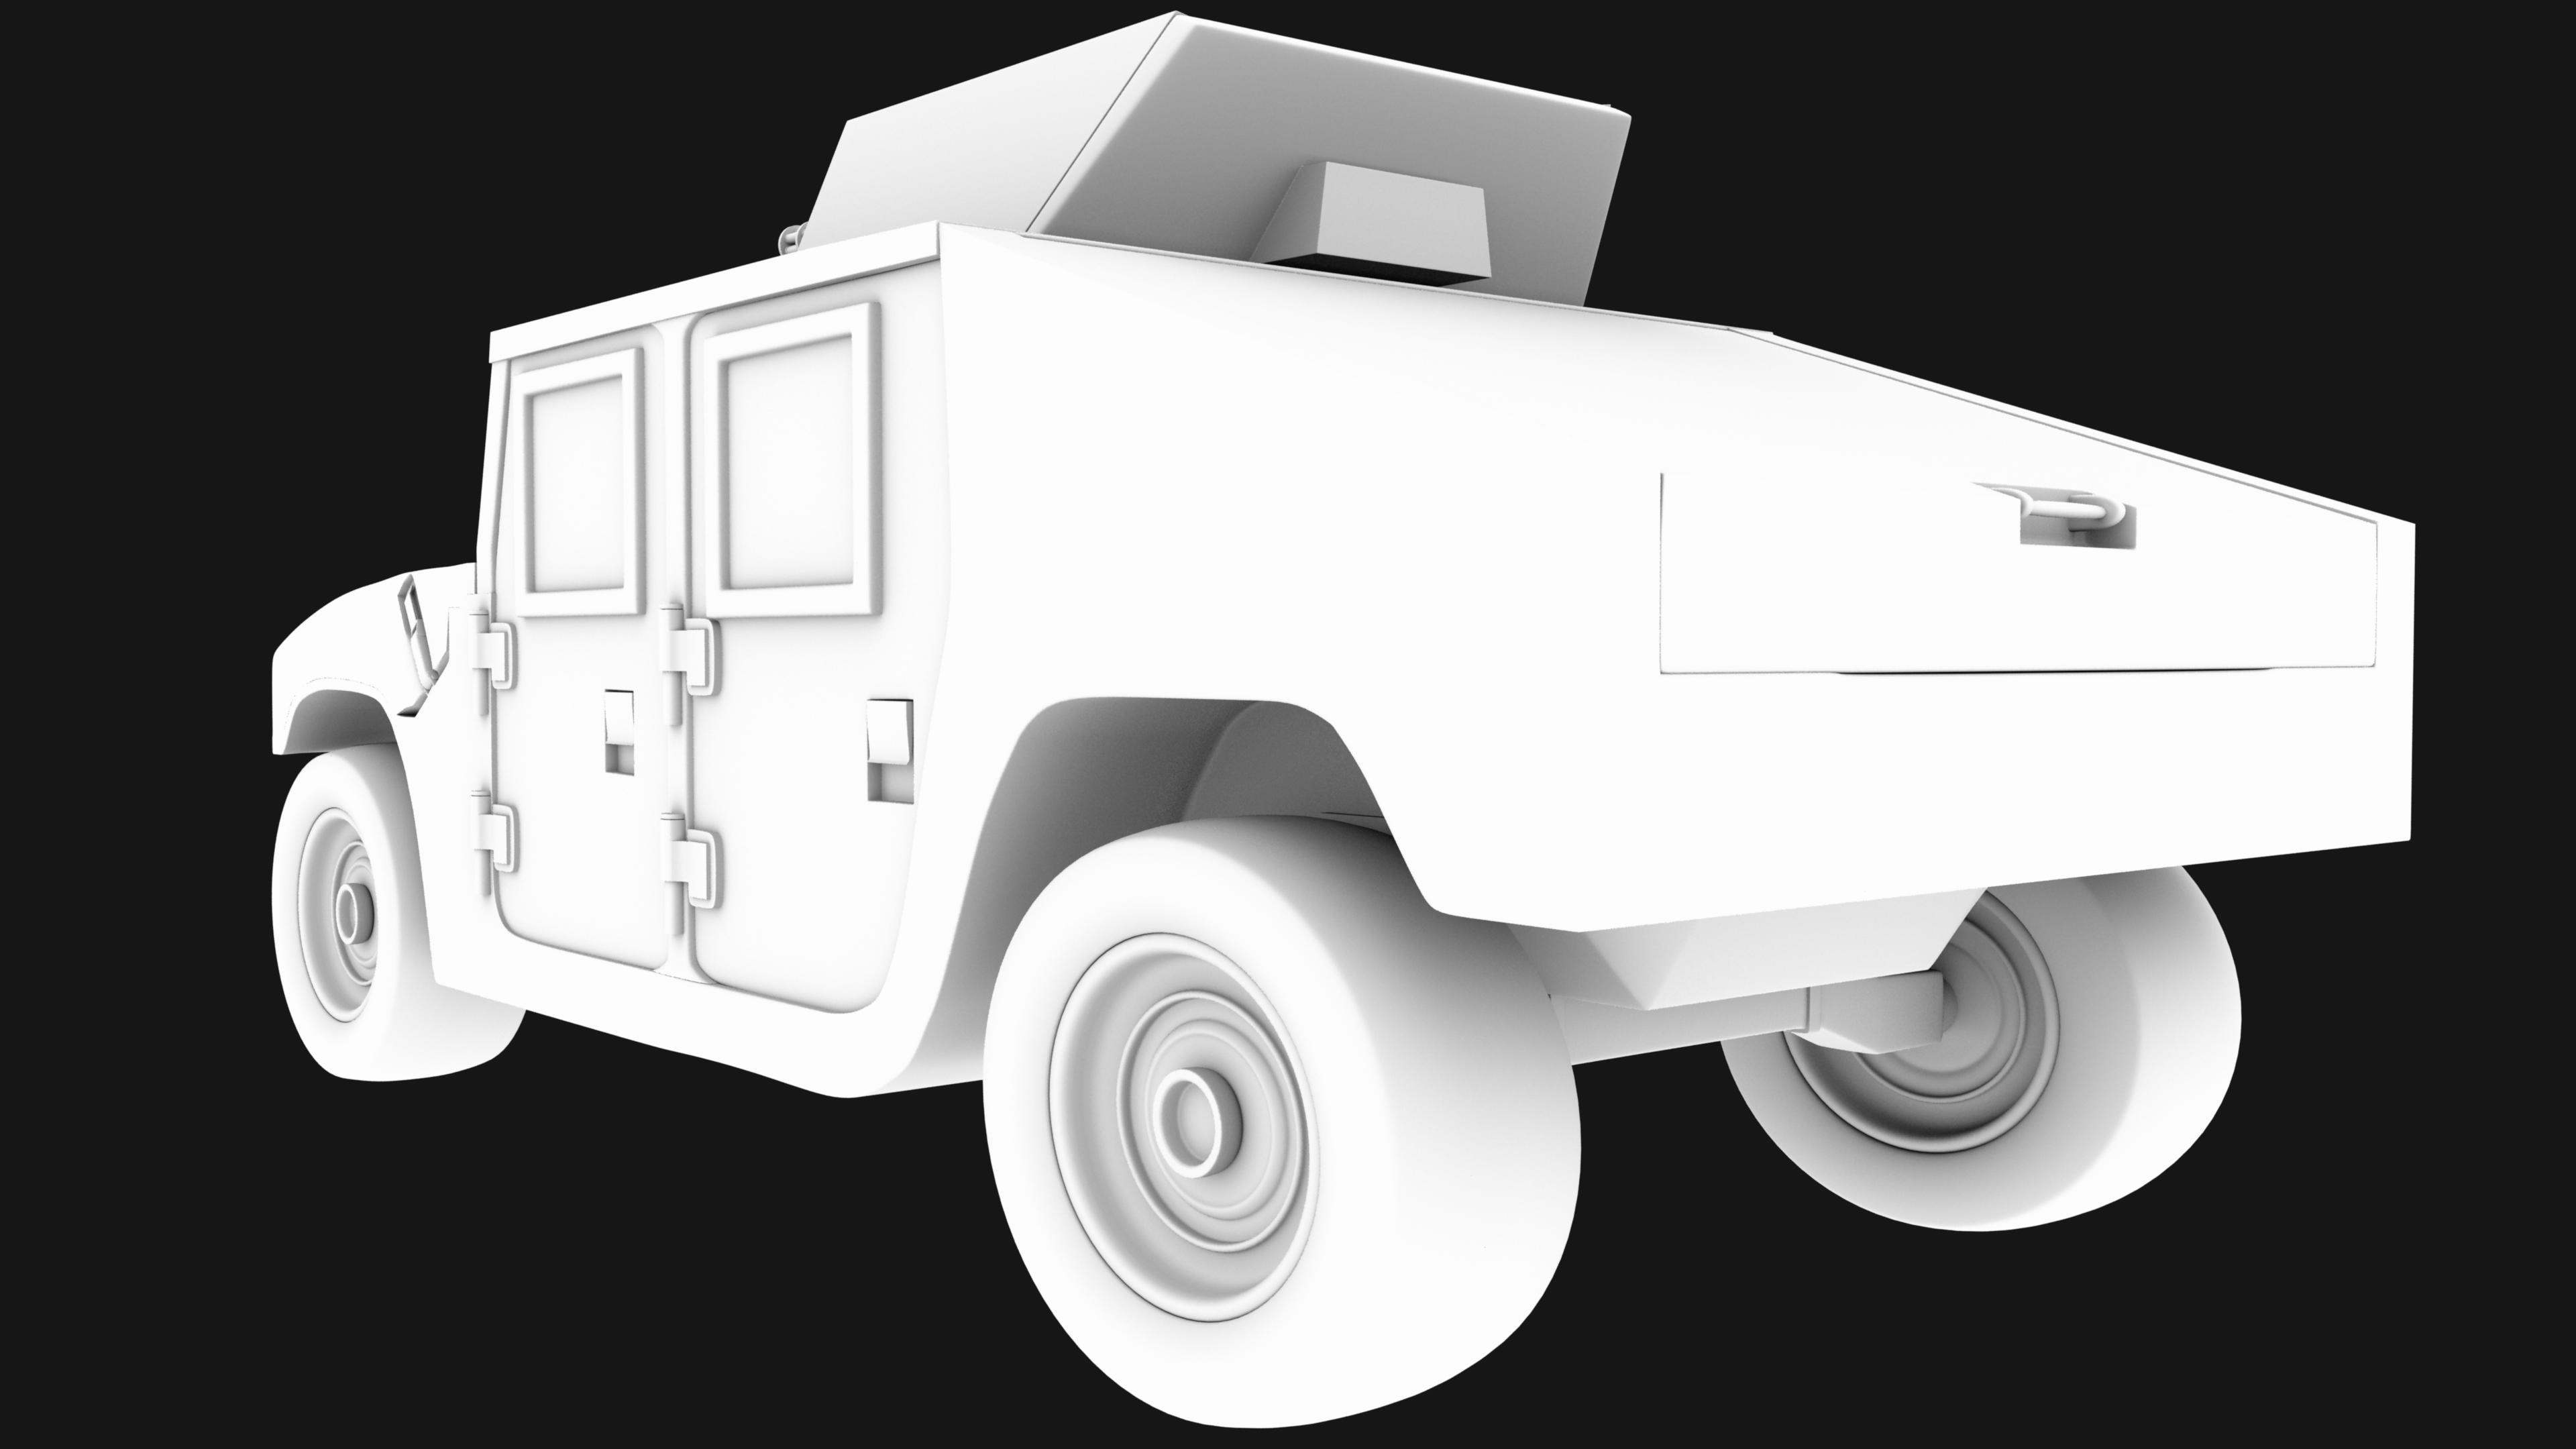 Humvee Rear